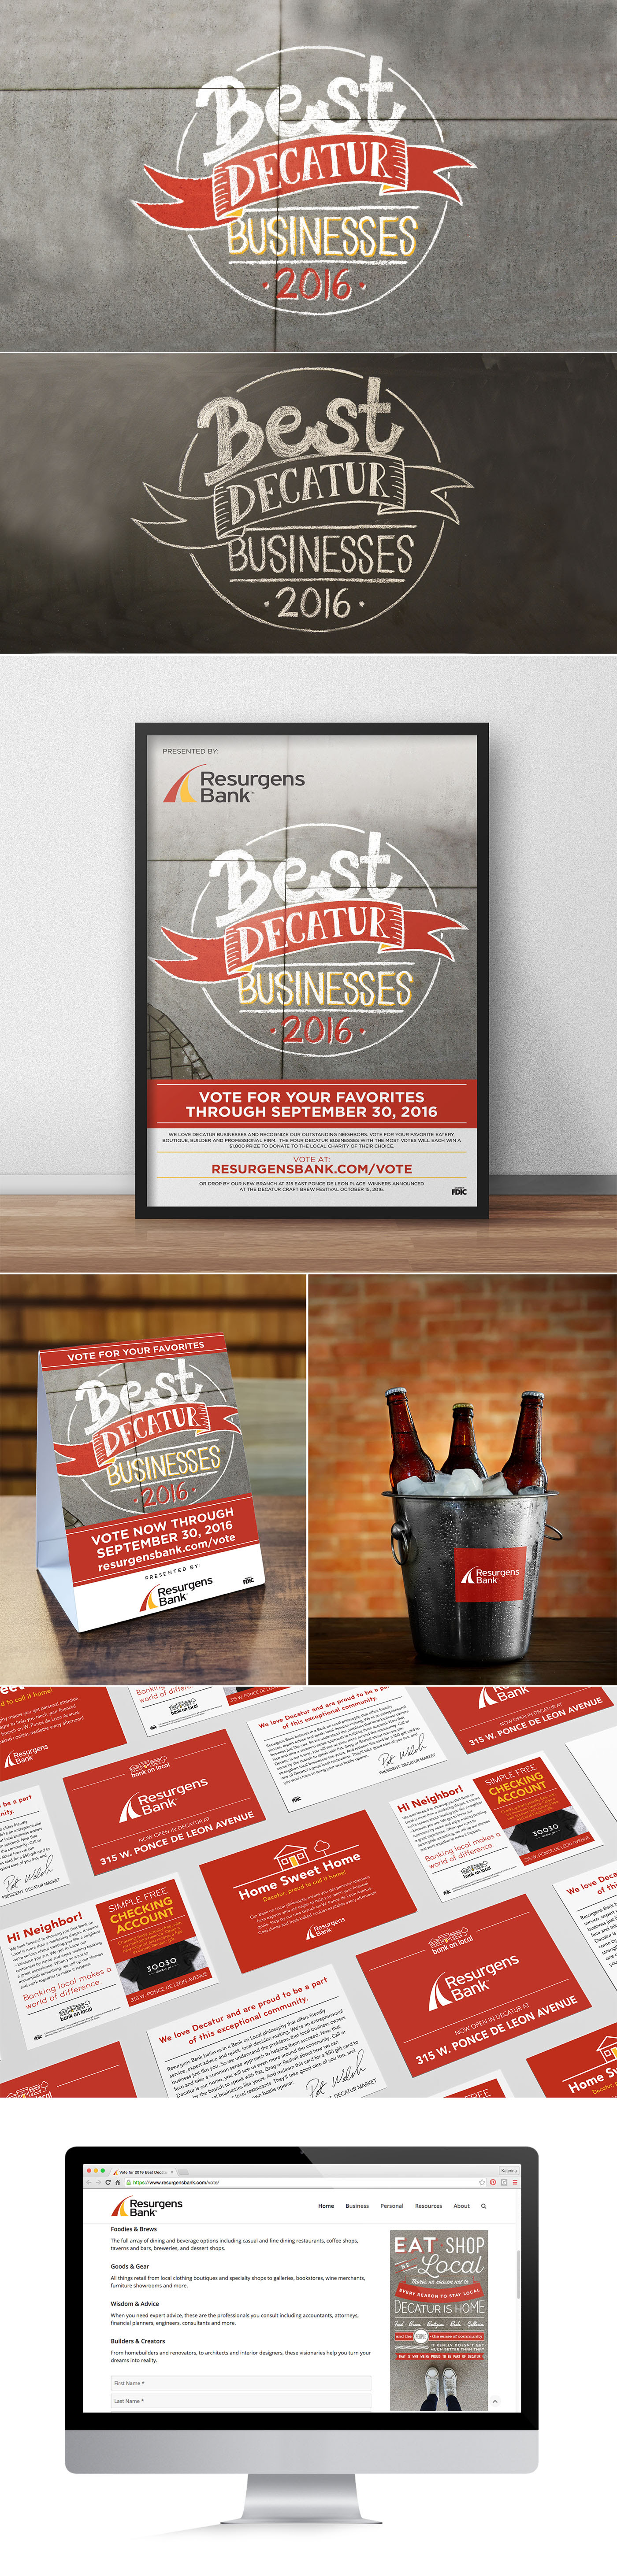 Best Decatur Businesses 2016